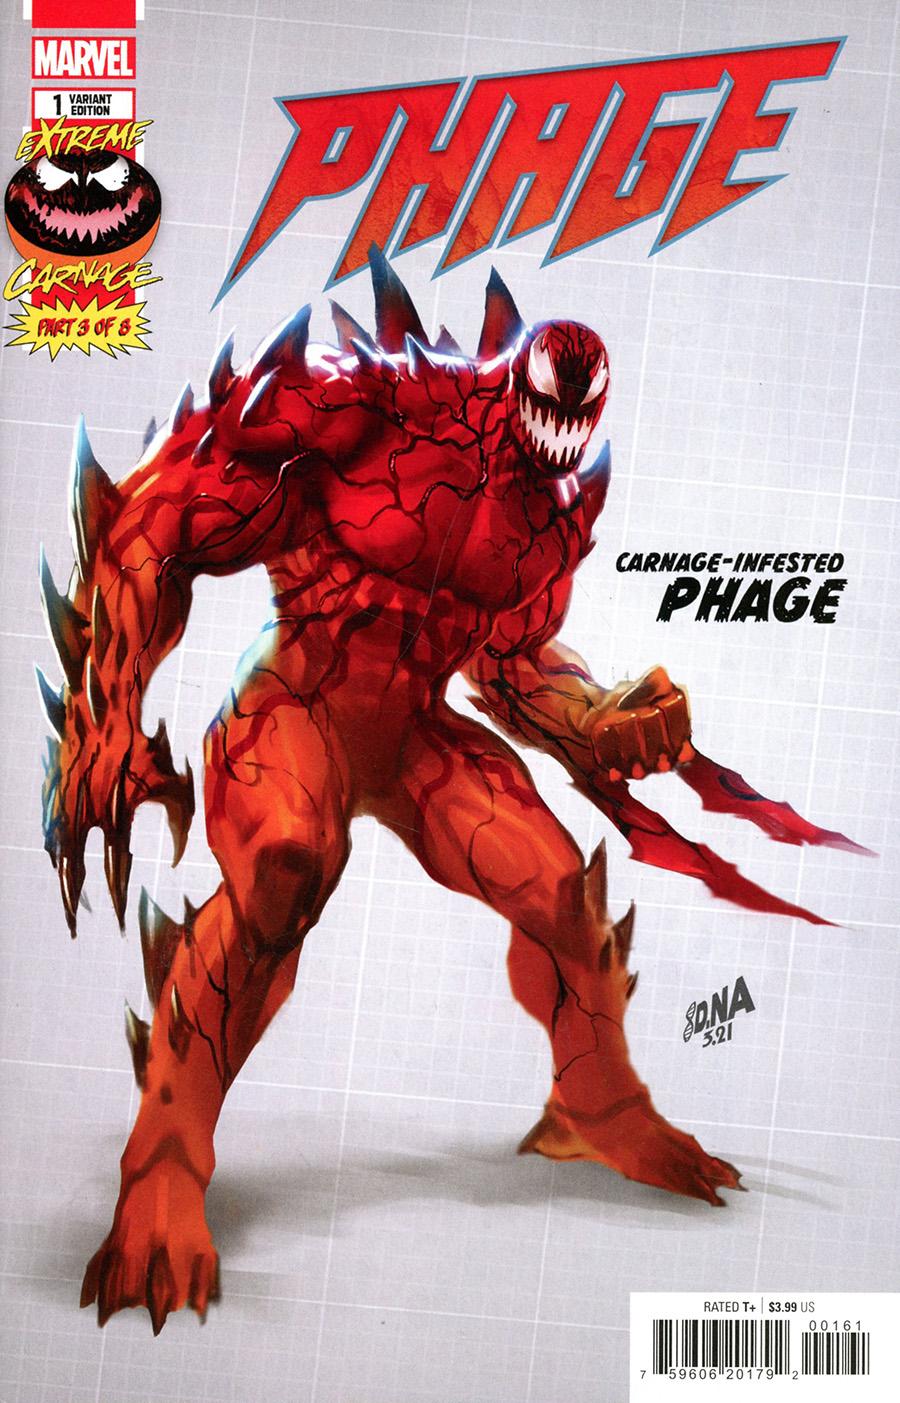 Extreme Carnage Phage #1 (One Shot) Cover D Incentive David Nakayama Design Variant Cover